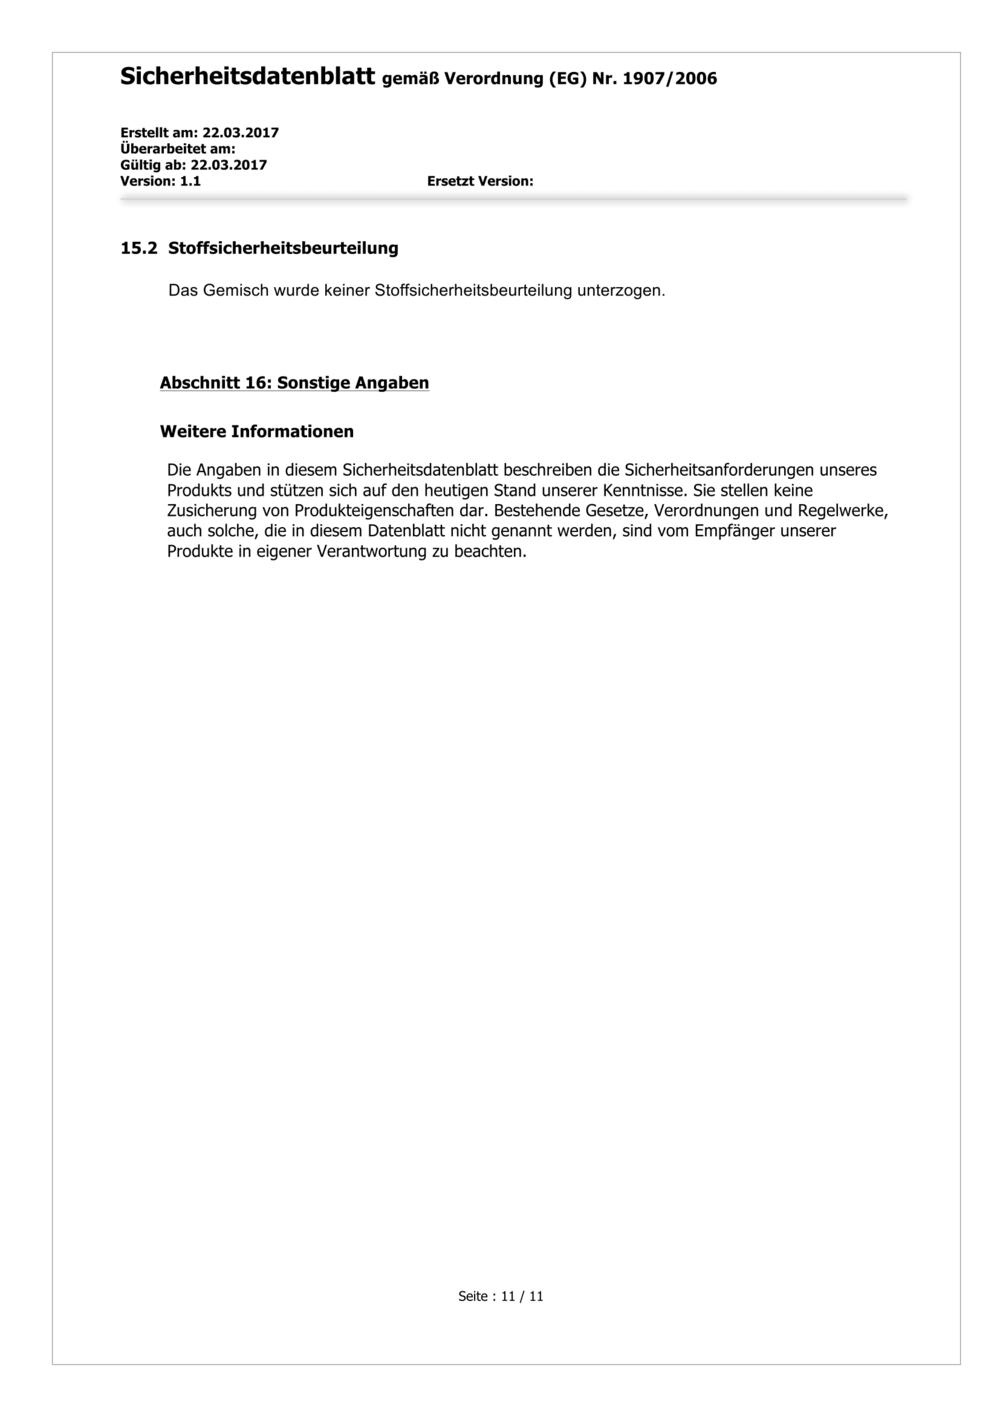 MSDB_MC40-11.png